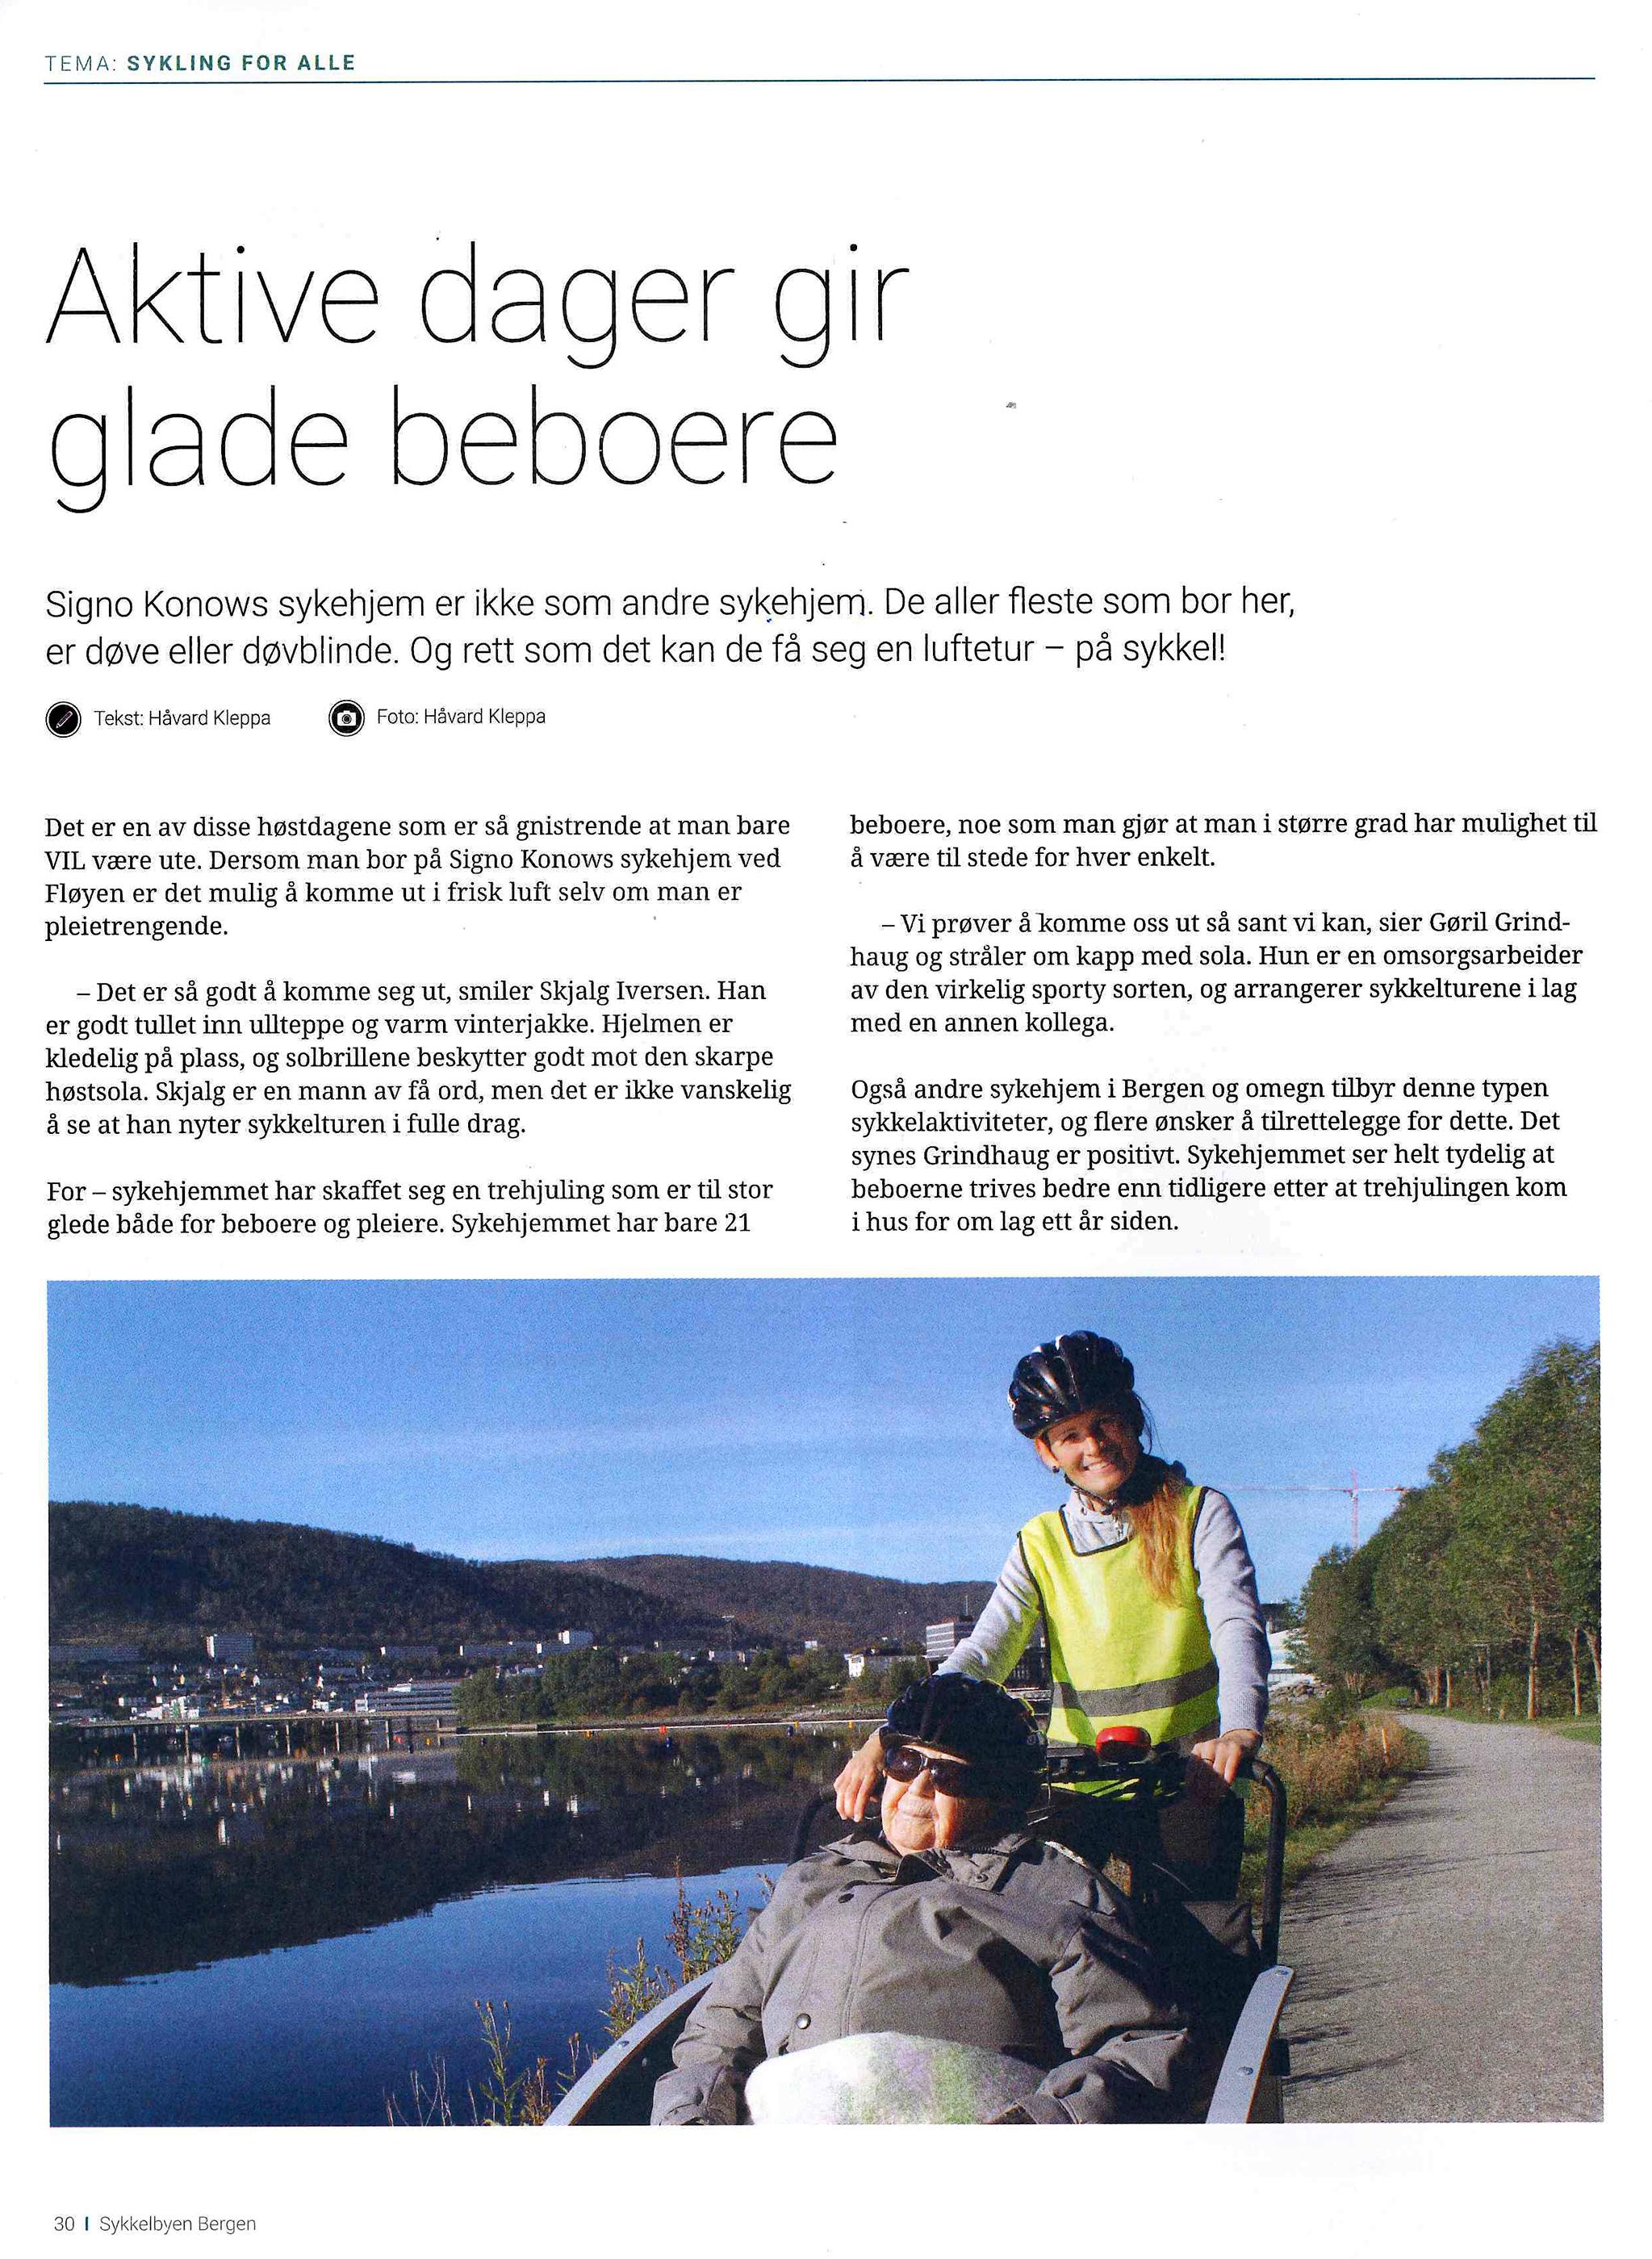 2017-04-18 Sykkelbyen Bergen